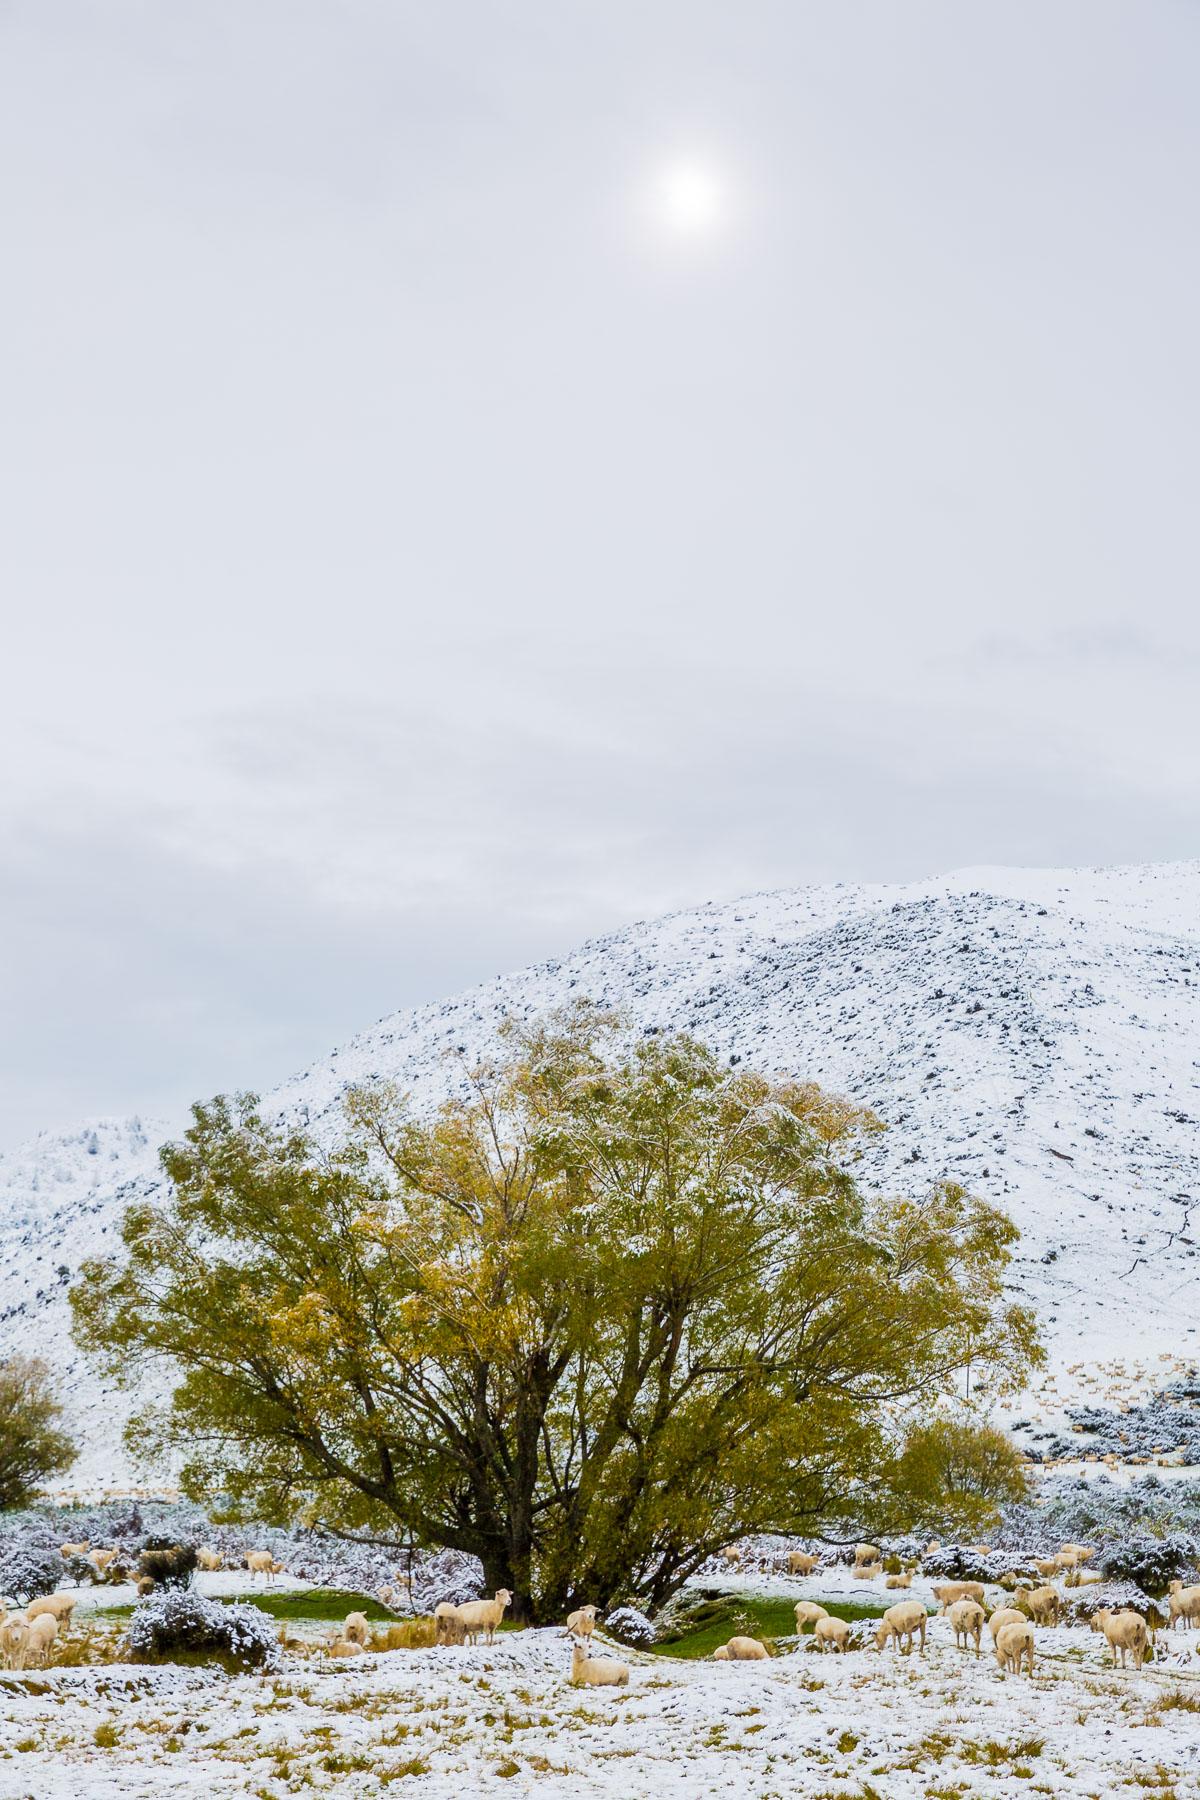 farm-morning-lake-tekapo-fresh-snow-snowfall-storm-autumn-crisp-cold-sheep.jpg